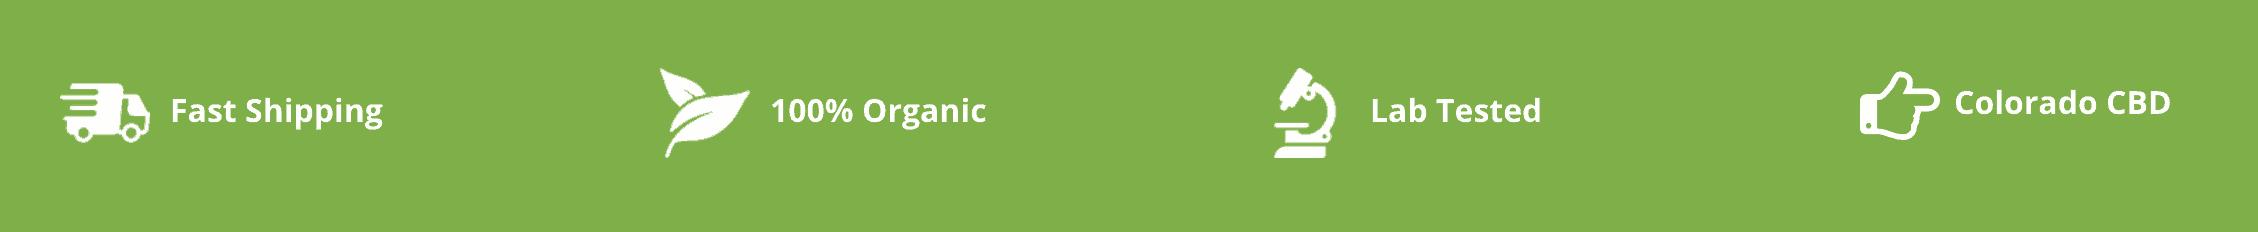 Thoughtcloud coupon codes discounts promos - CBD - Save On Cannabis